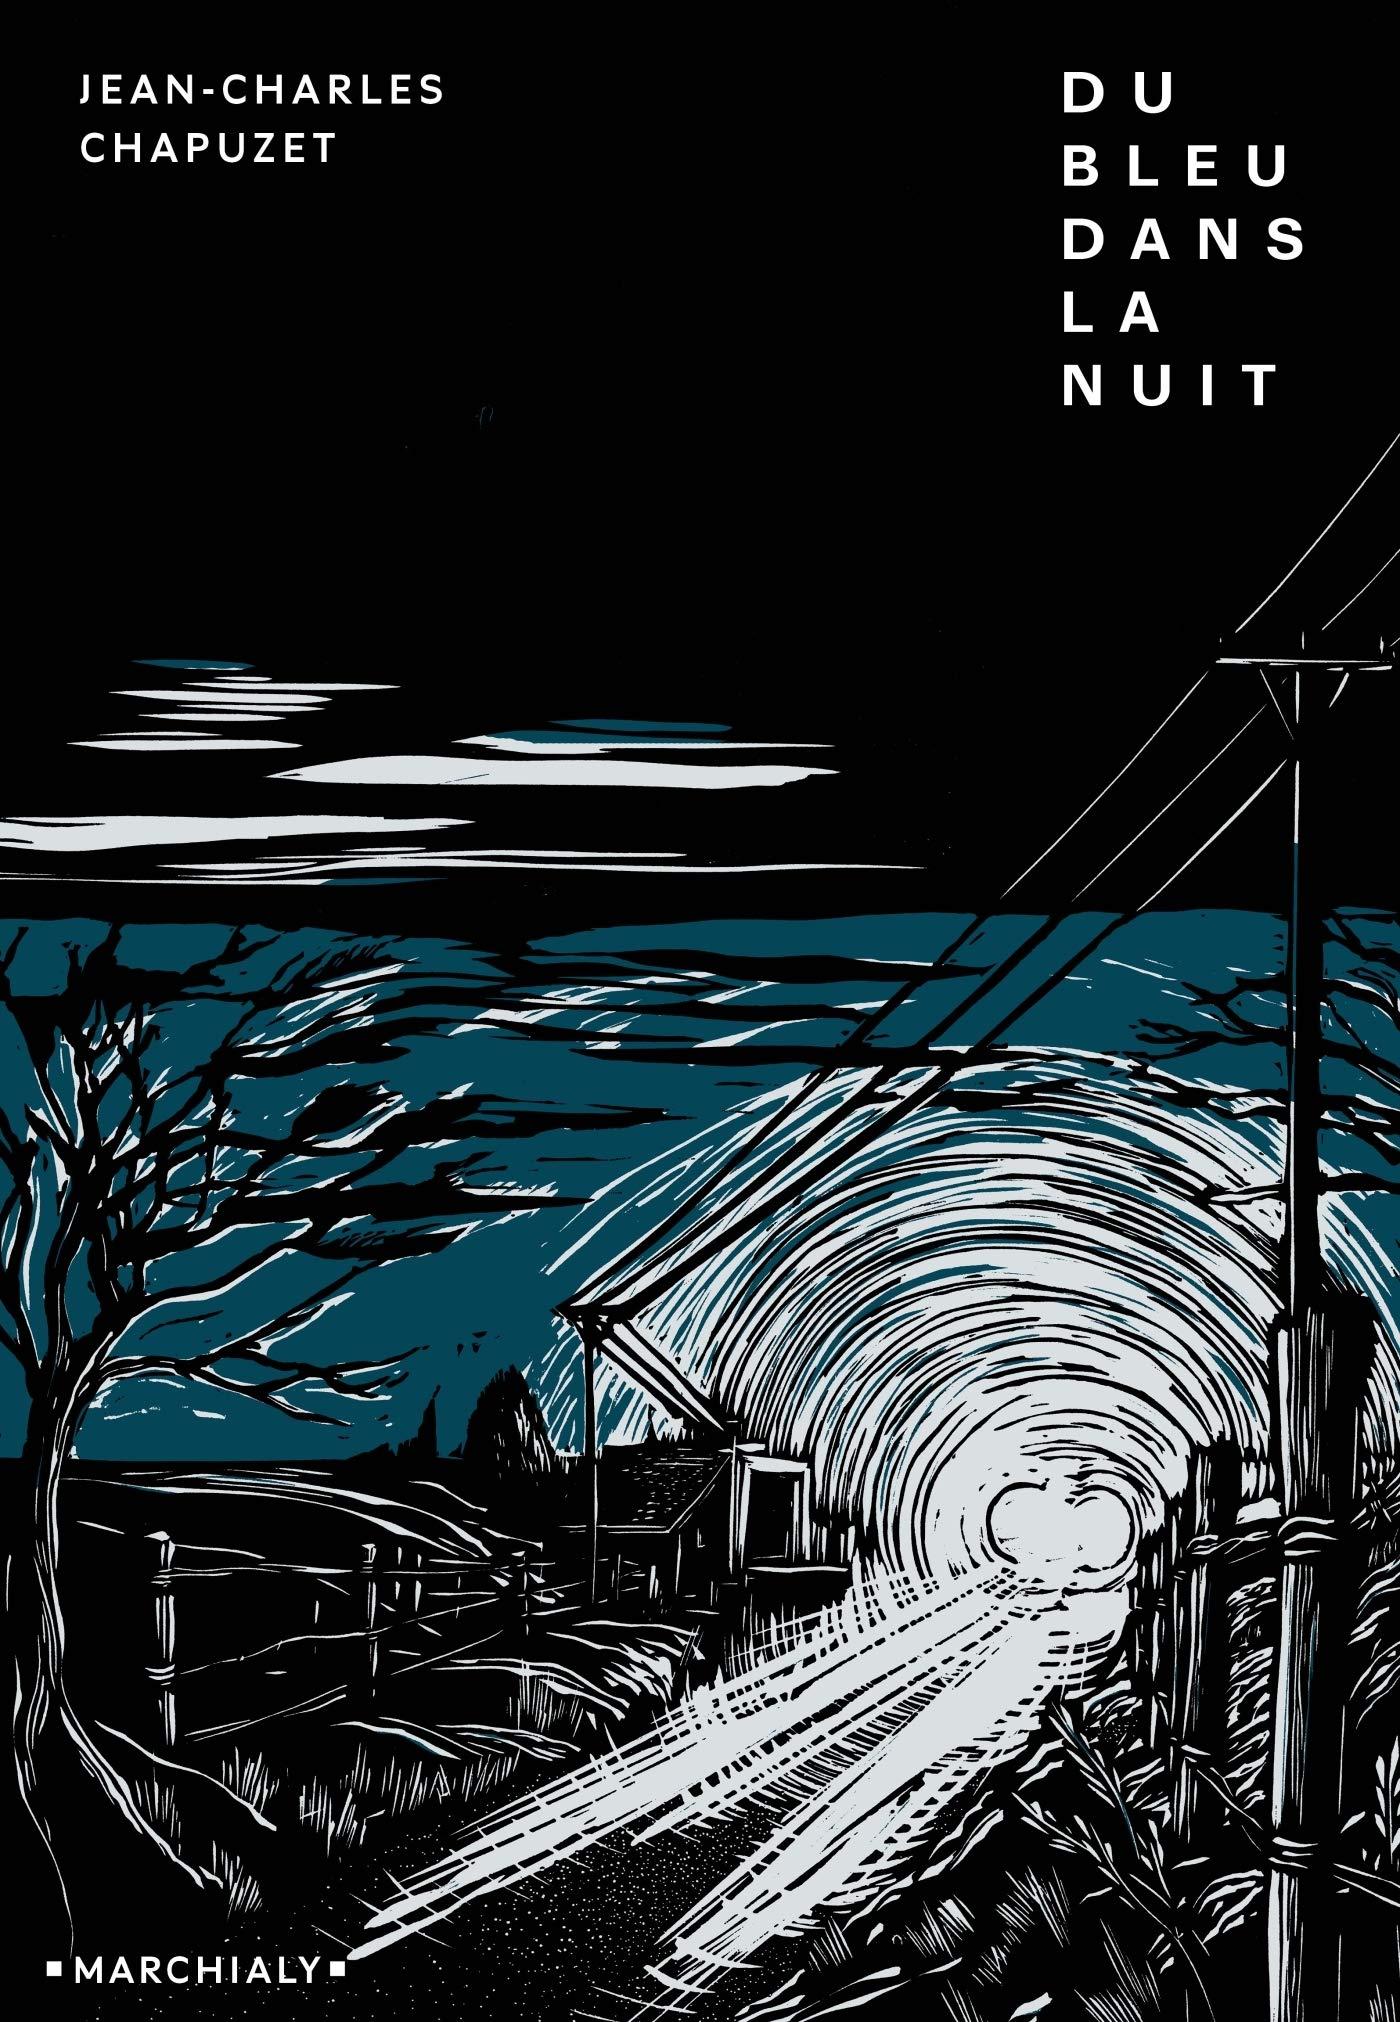 Du bleu dans la nuit - Jean-Charles Chapuzet 81bIbyptj7L